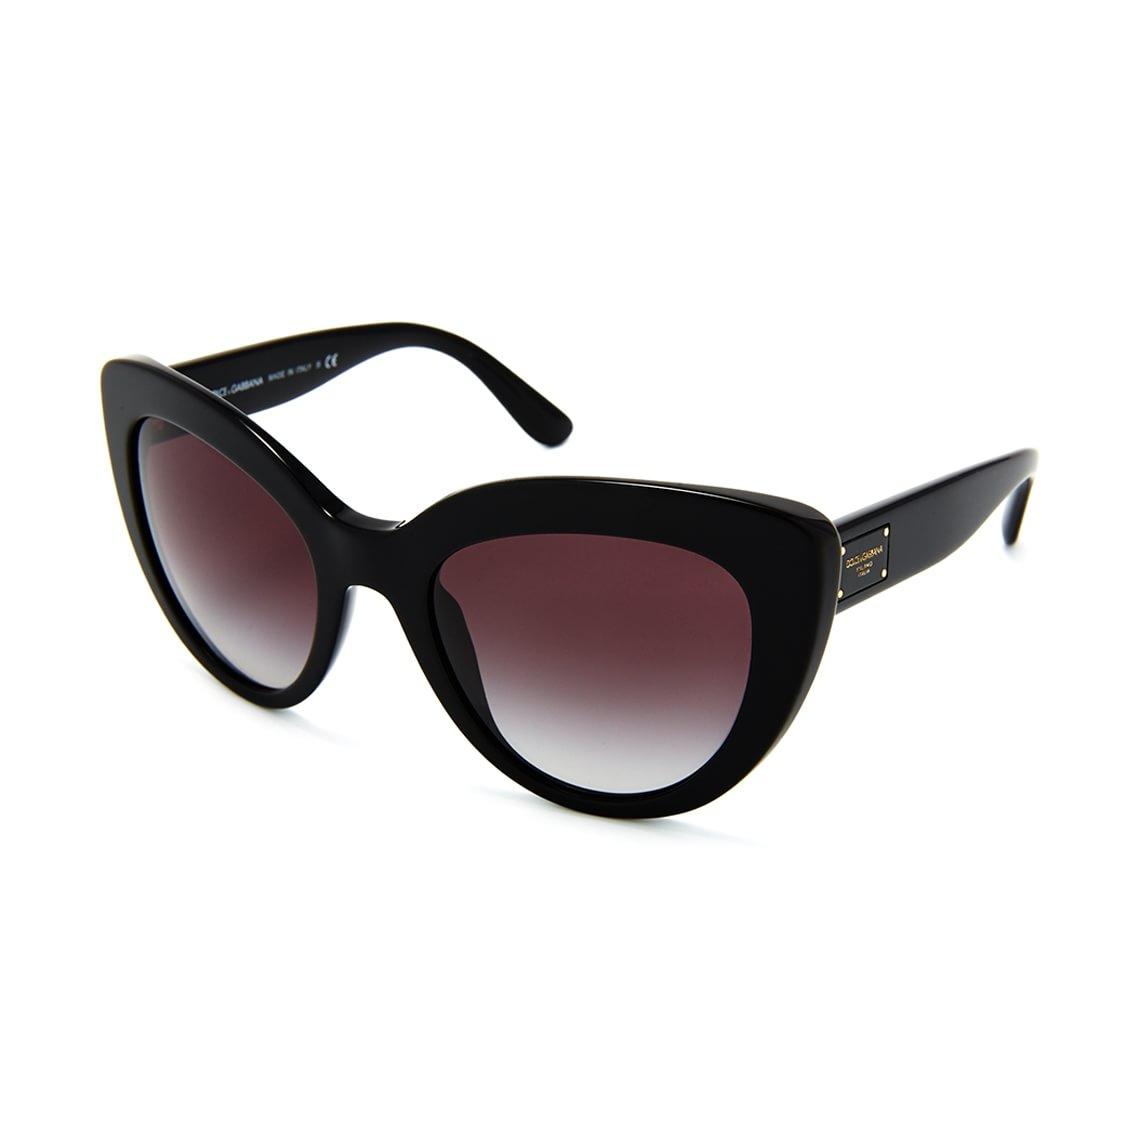 Dolce   Gabbana DG4287 501 8G 5321 - Synsam da06acdf501a2